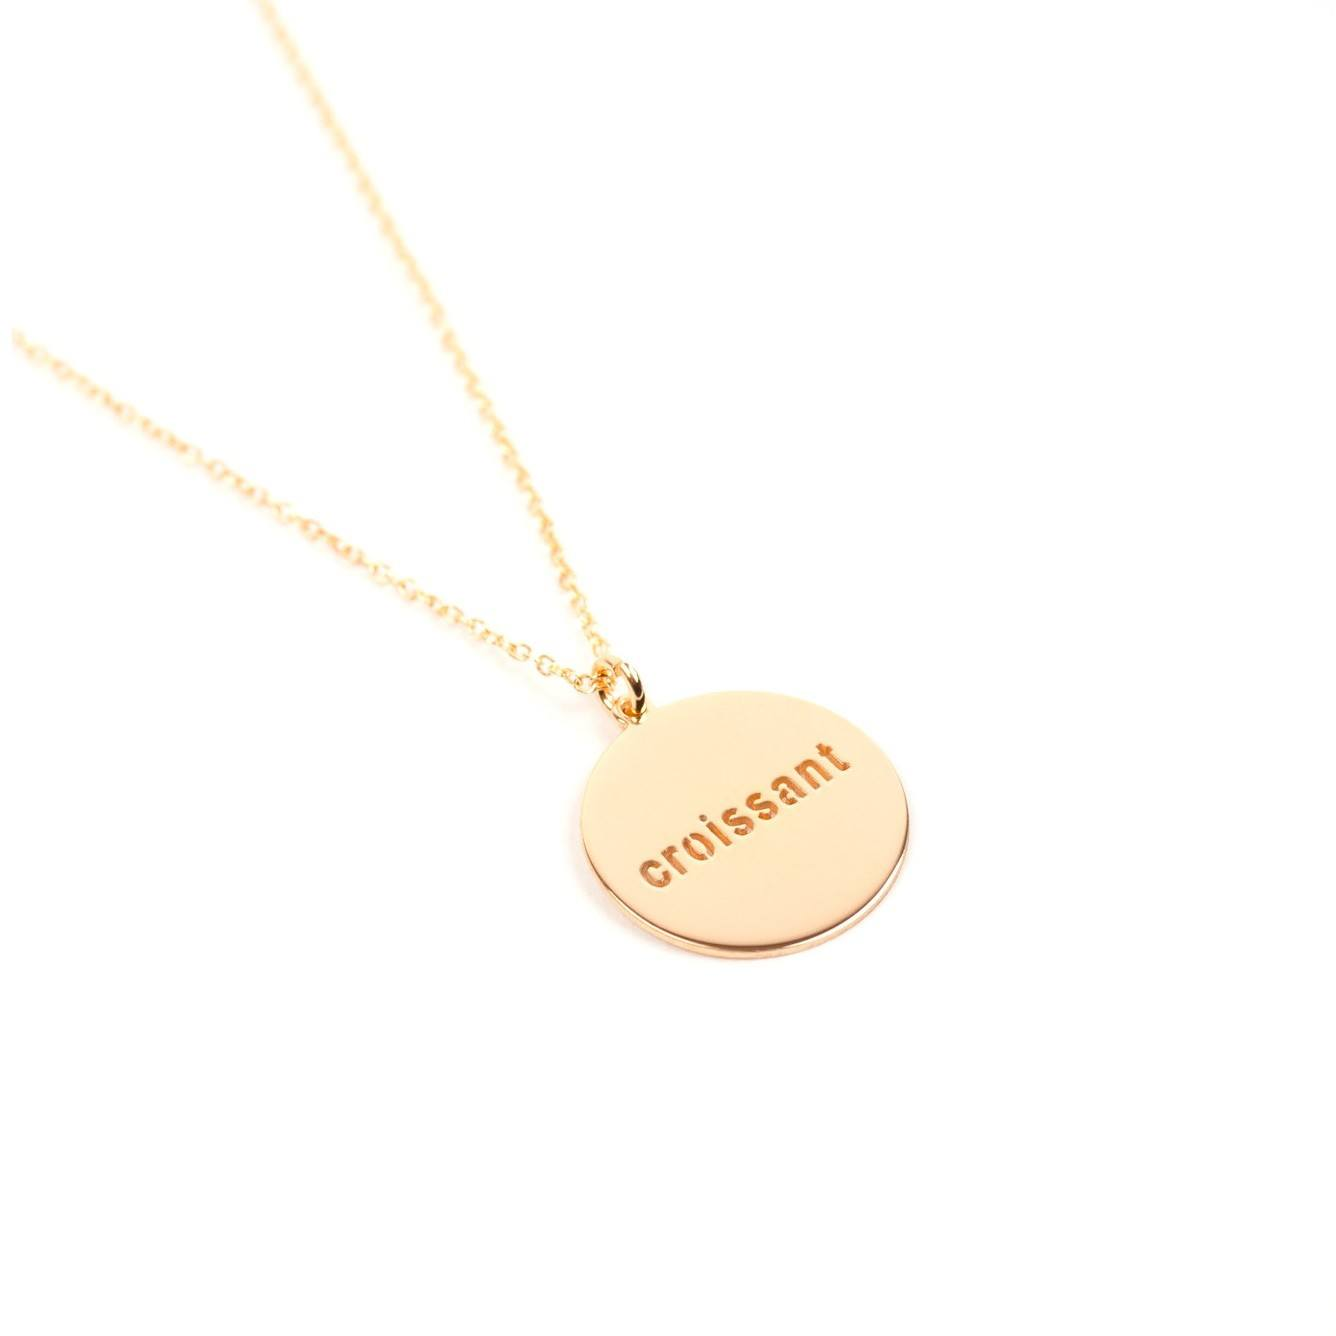 https://www.selecteddesigners.dk/media/catalog/product/j/u/jukserei-croissant-round-necklace-website.jpg